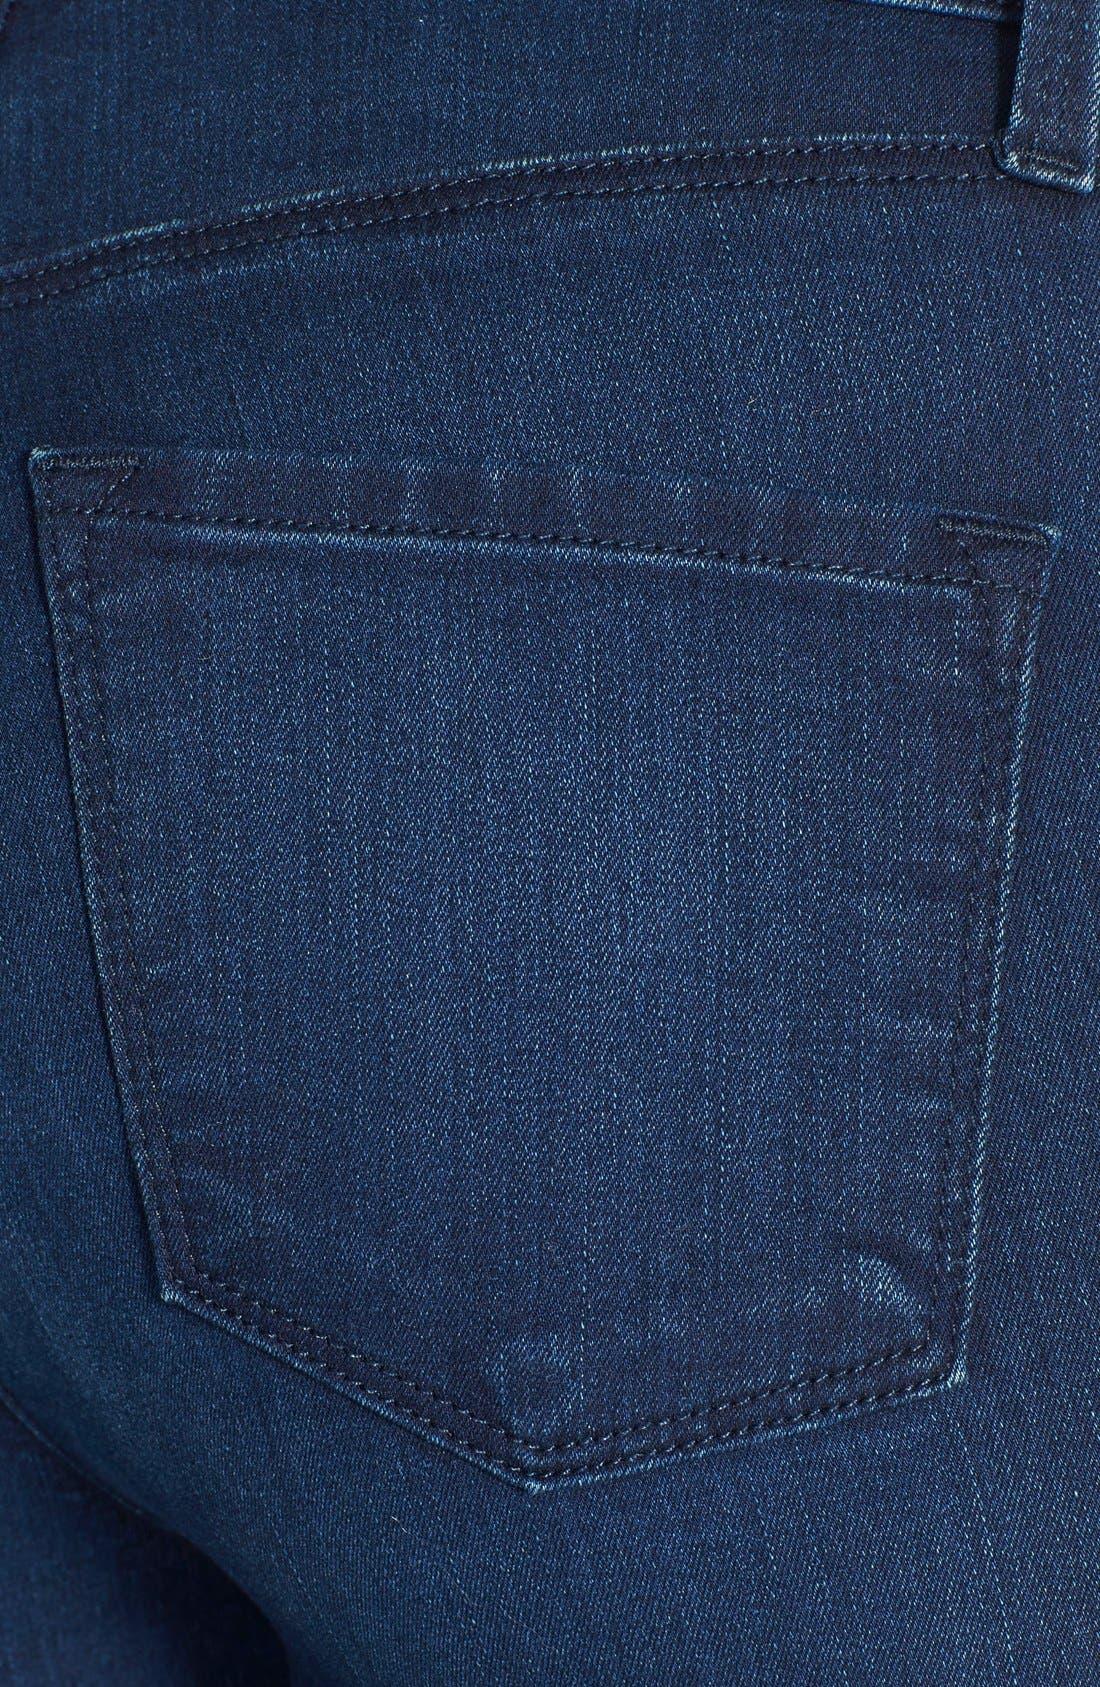 Alternate Image 3  - J Brand 'Maria' High Rise Skinny Jeans (Maria Destiny)